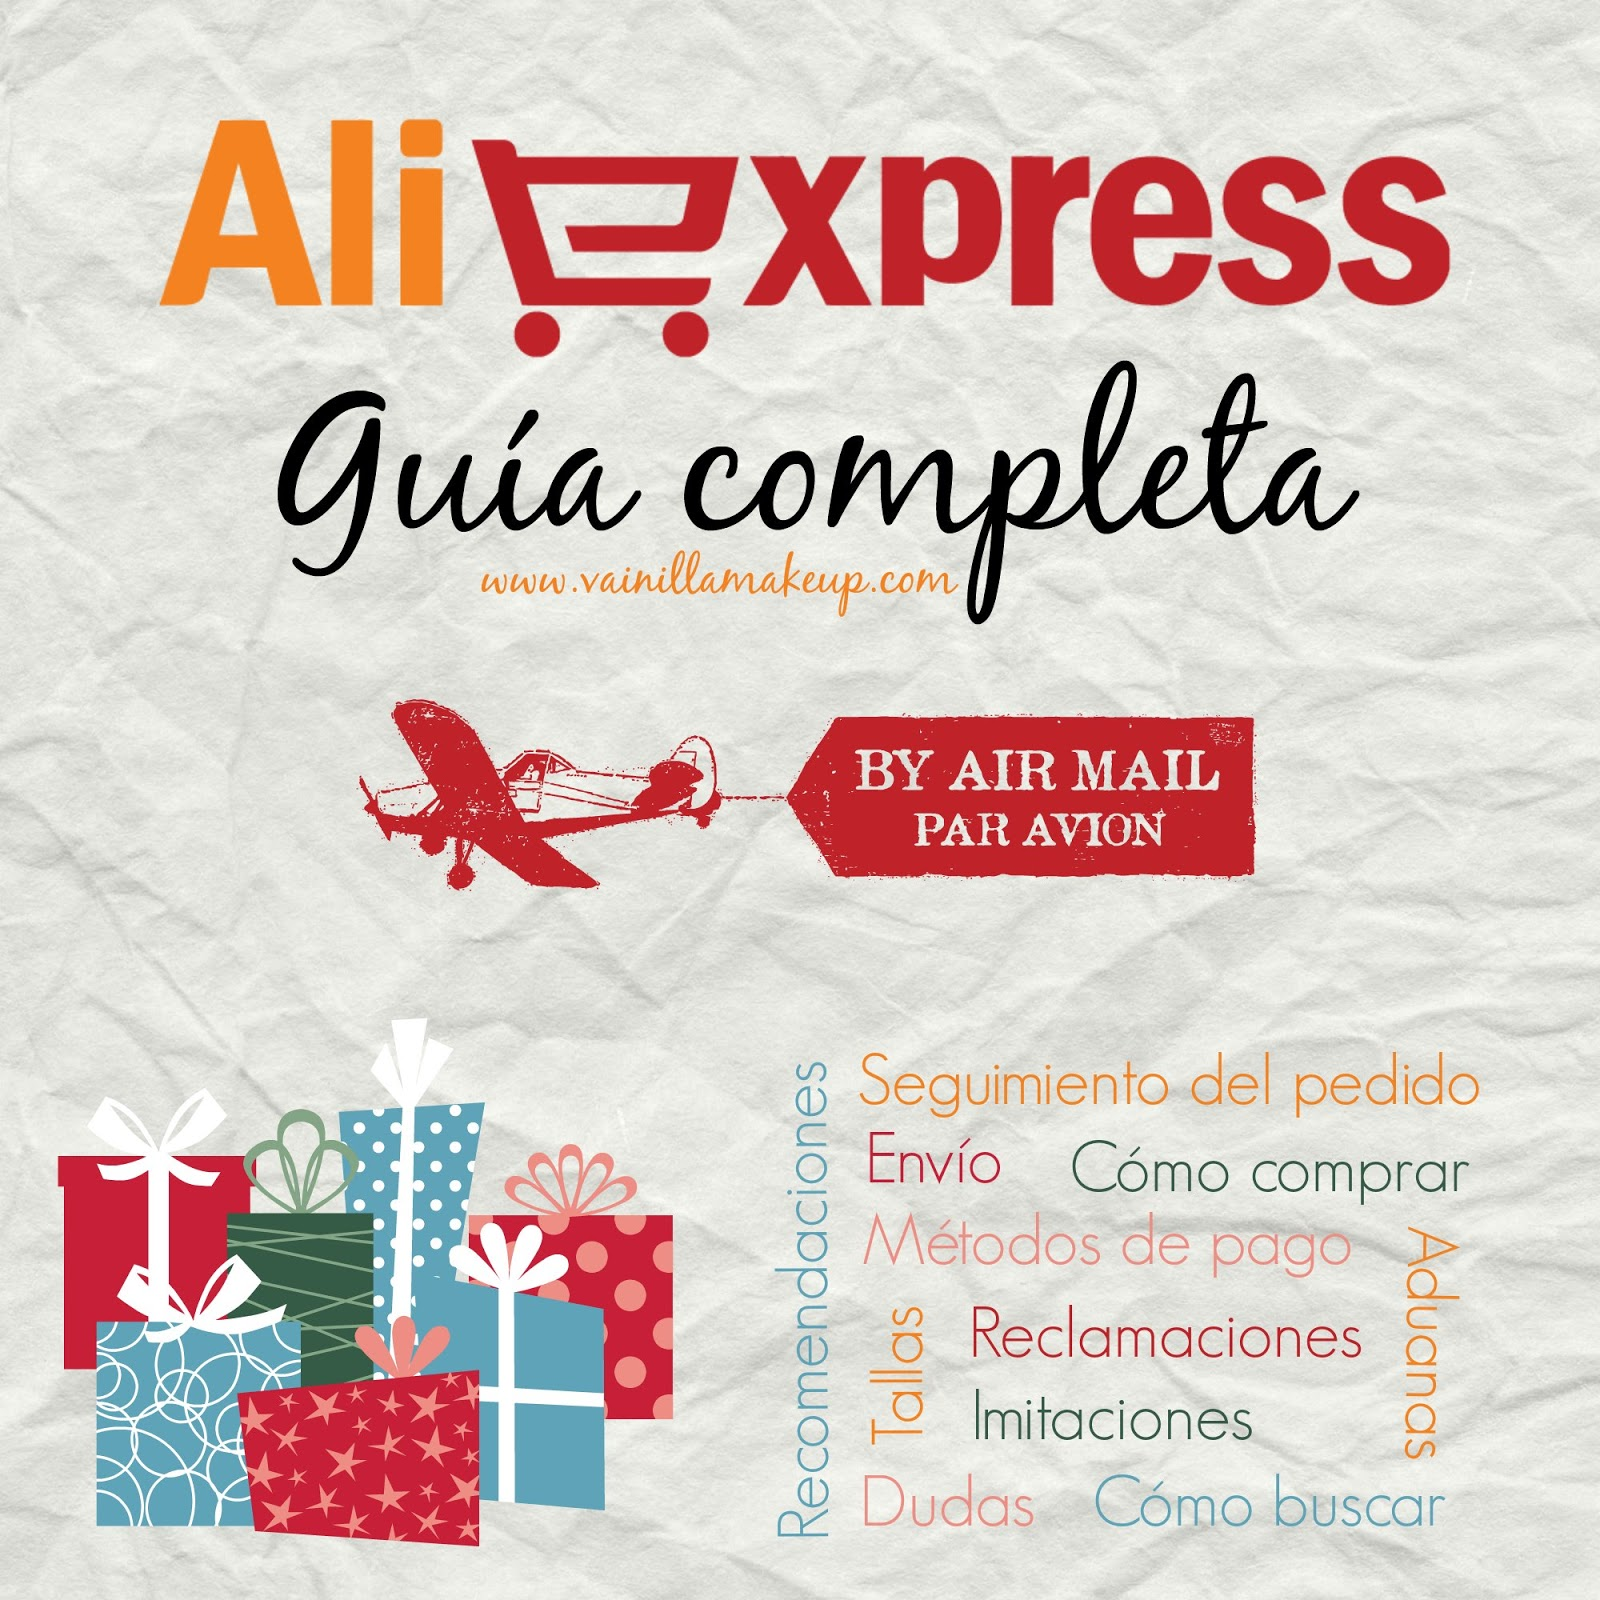 http://vainillamakeup.blogspot.com.es/2014/12/como-comprar-en-aliexpress.html